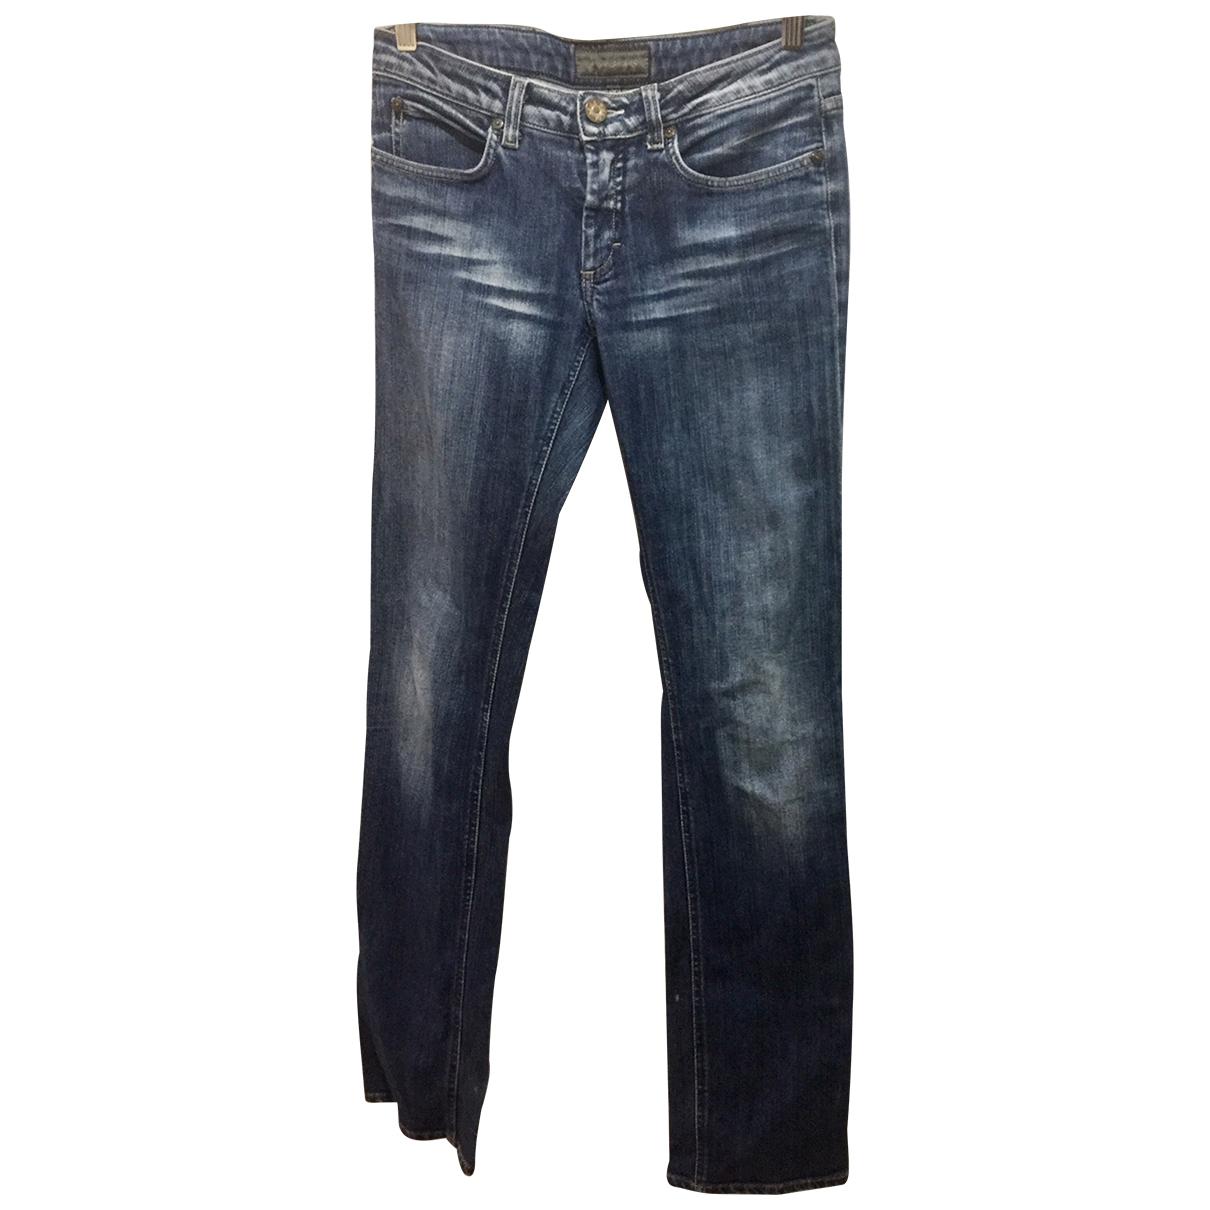 Acne Studios \N Blue Cotton - elasthane Jeans for Women 30 US